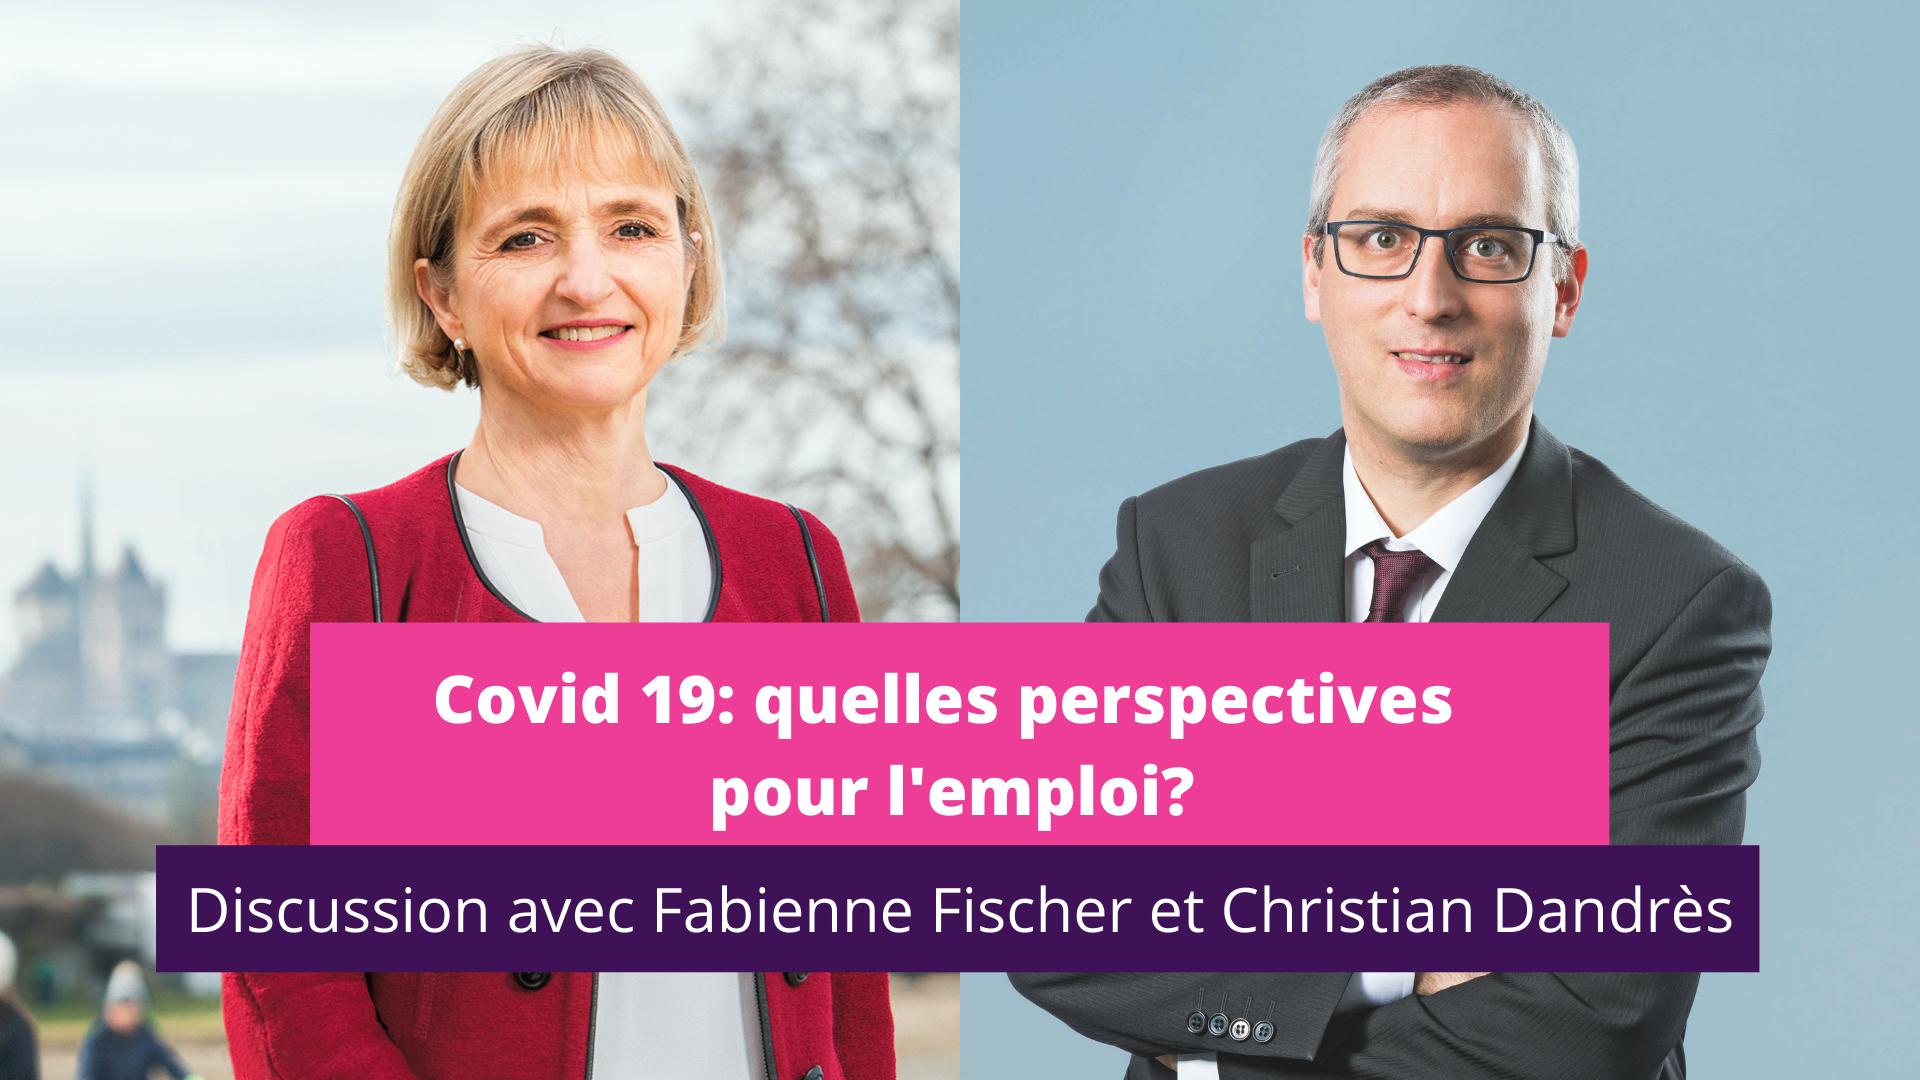 Facebook live - Fabienne Fischer et Christian Dandres